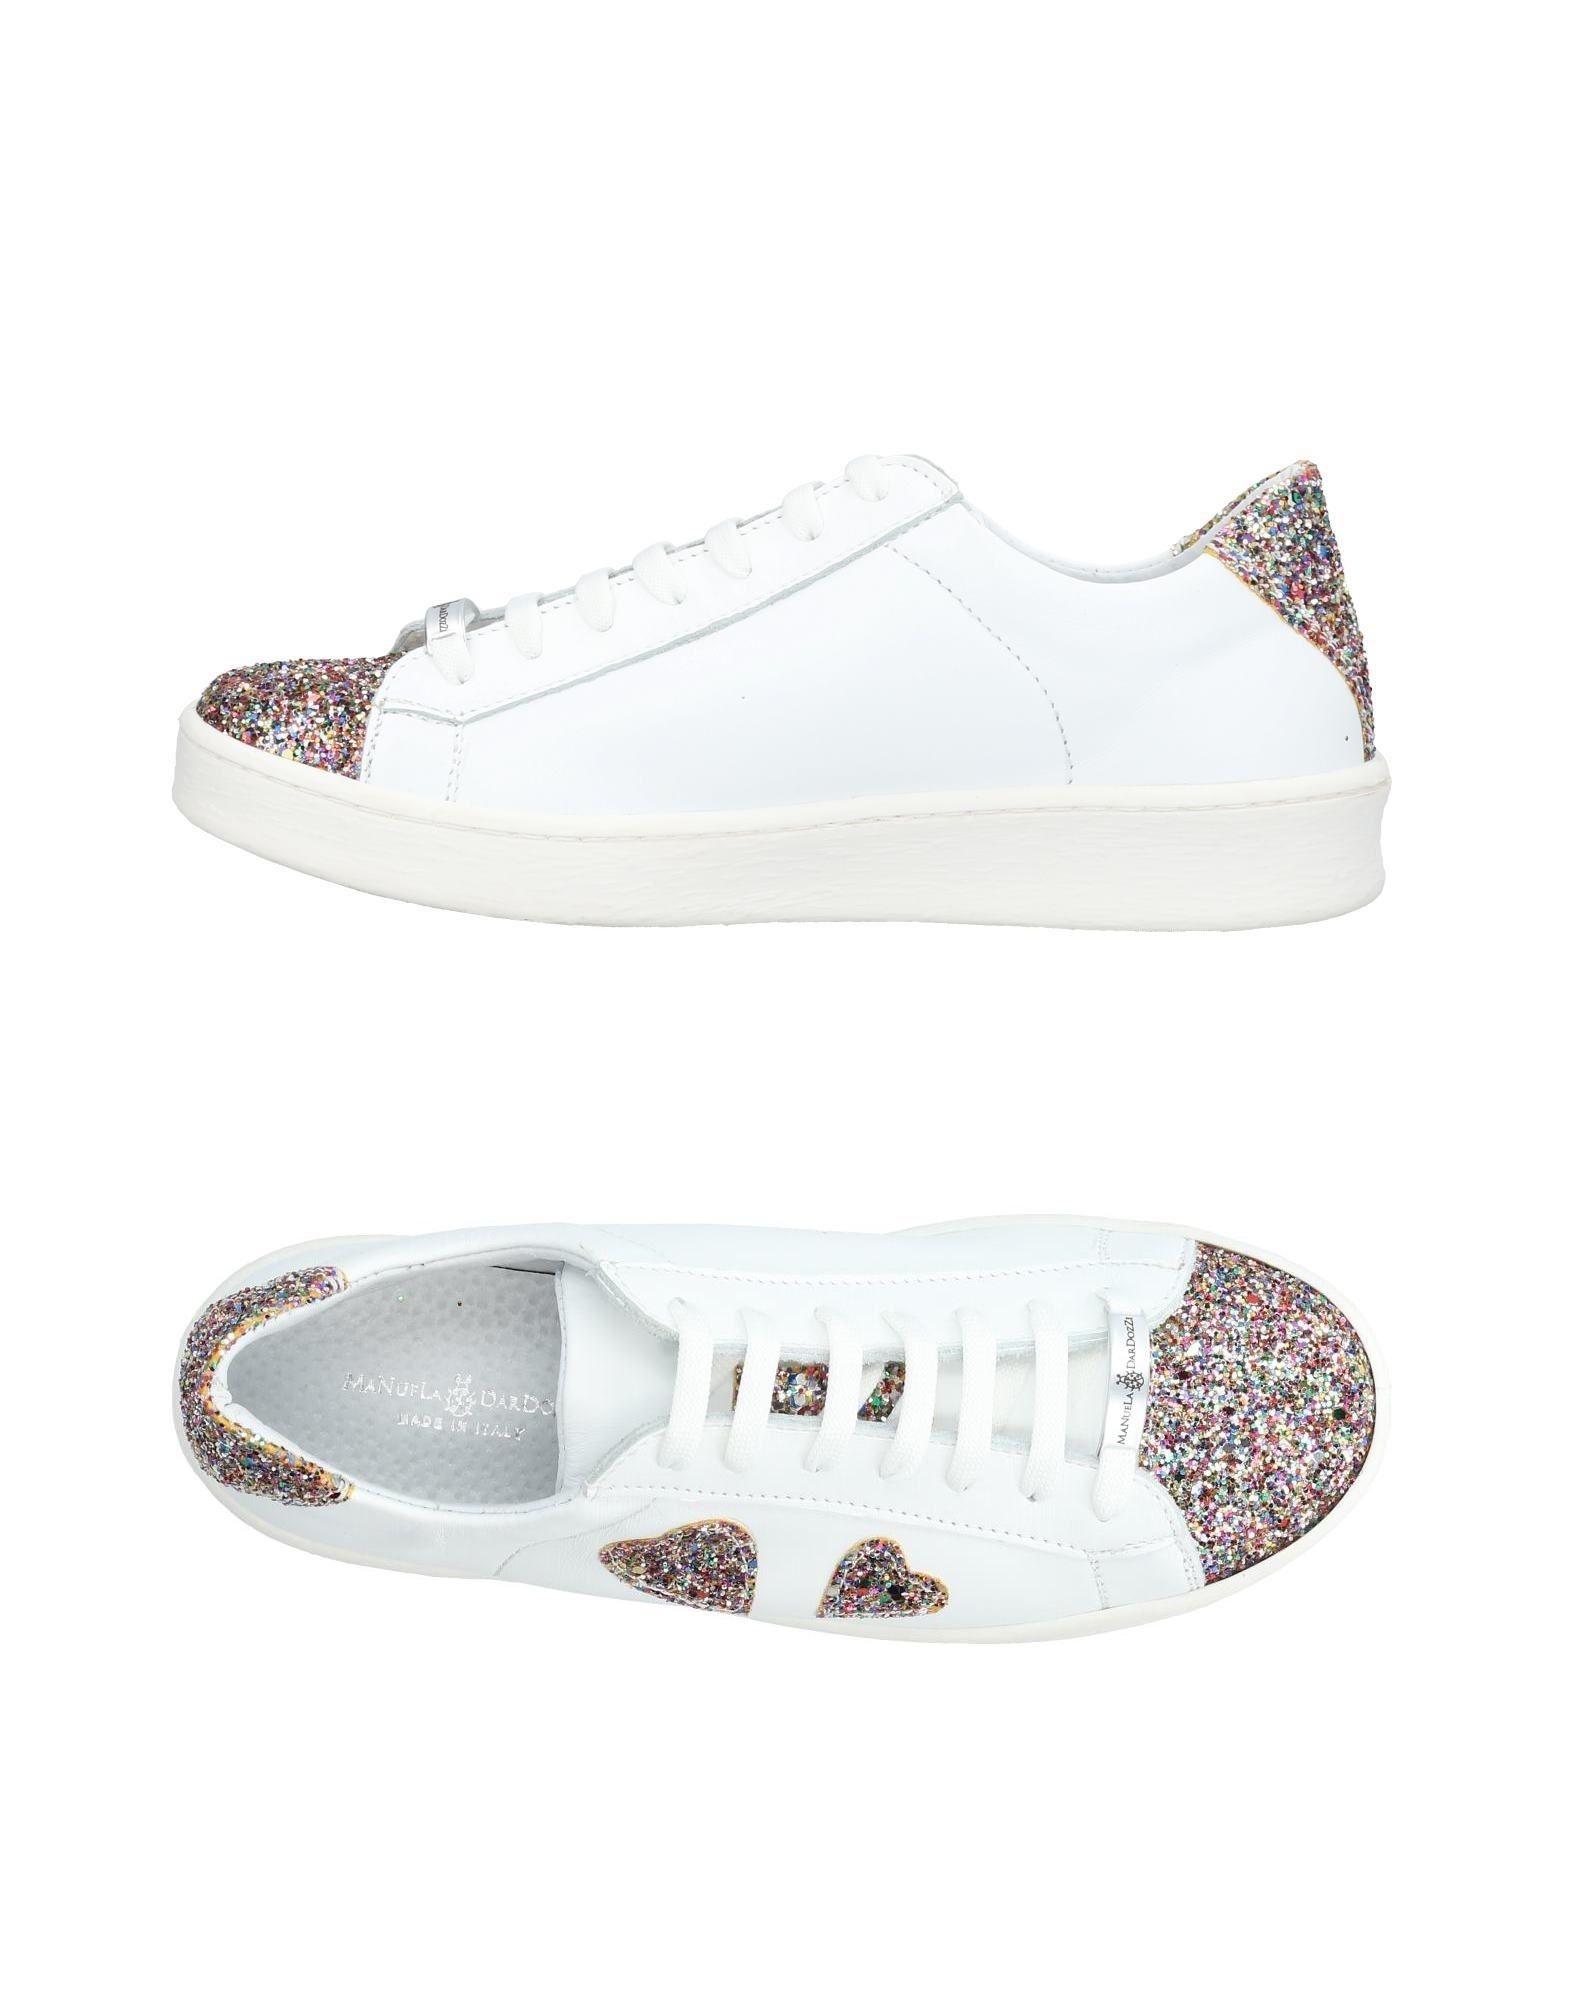 Manuela Dardozzi Sneakers Damen  11423455CW Gute Qualität beliebte Schuhe